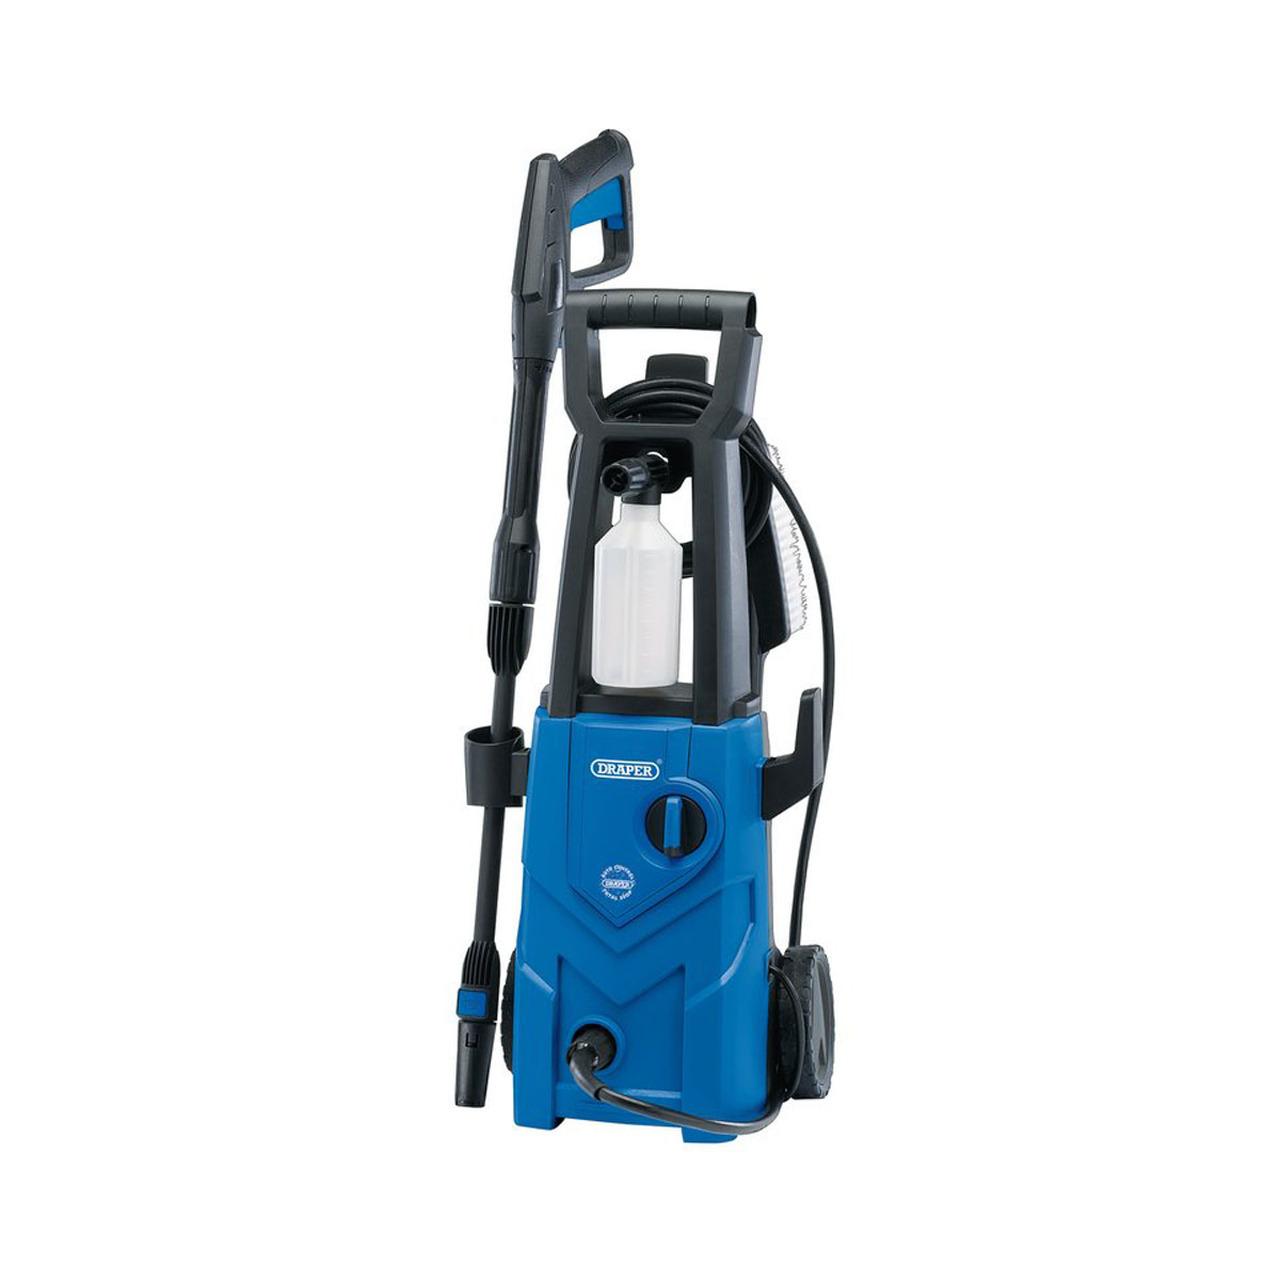 Draper Pressure Washer (135Bar) 98676